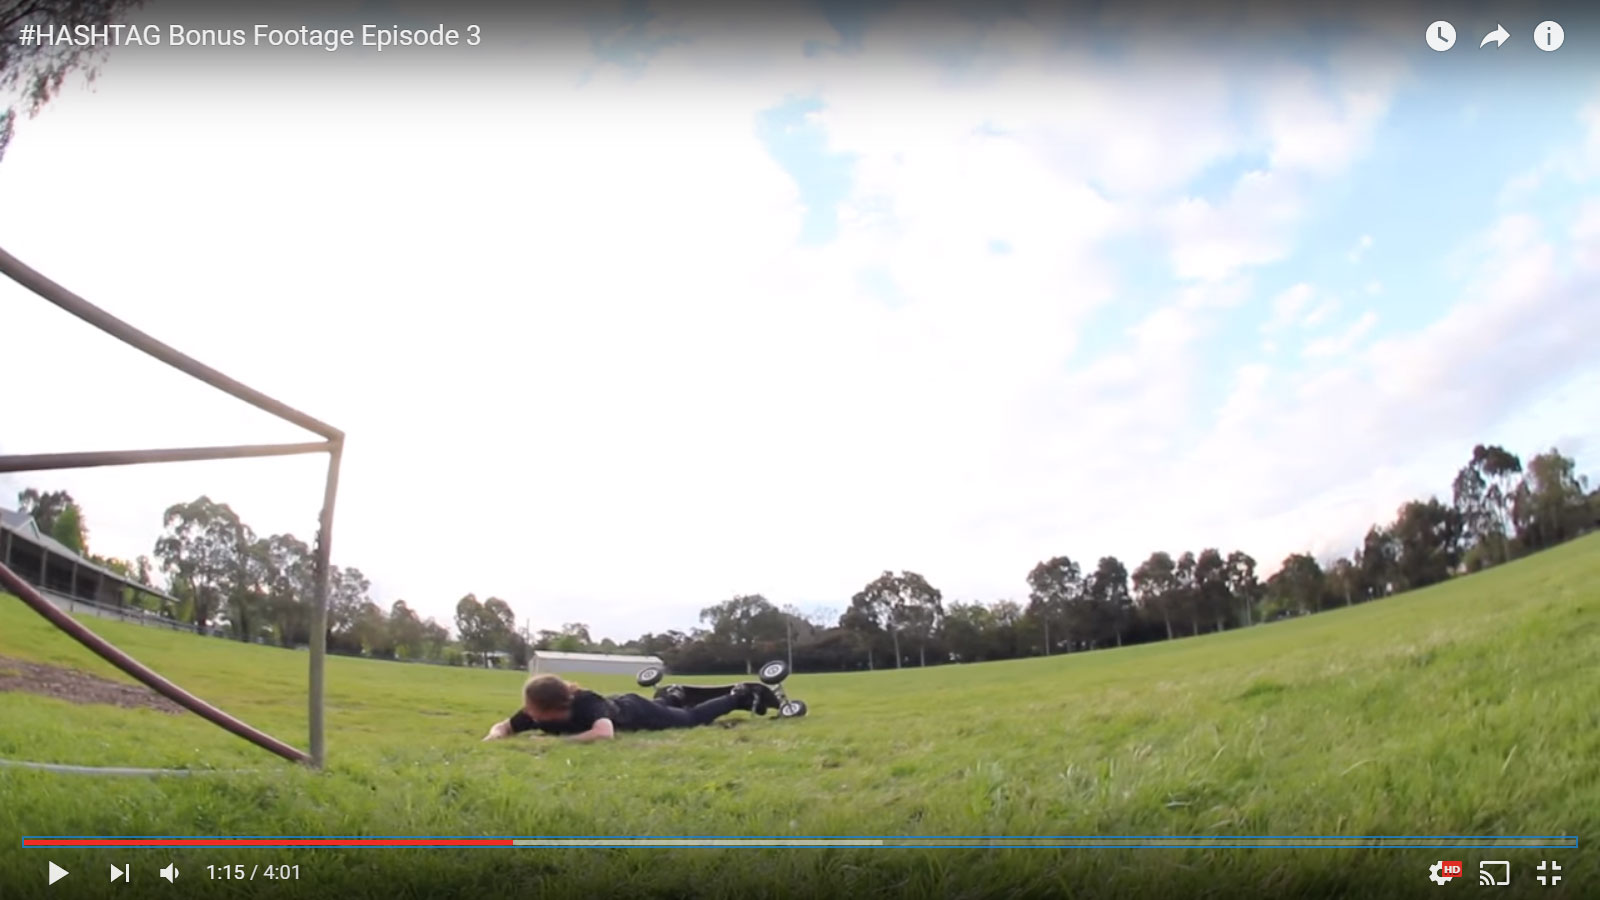 #HASHTAG Bonus Footage Episode 3